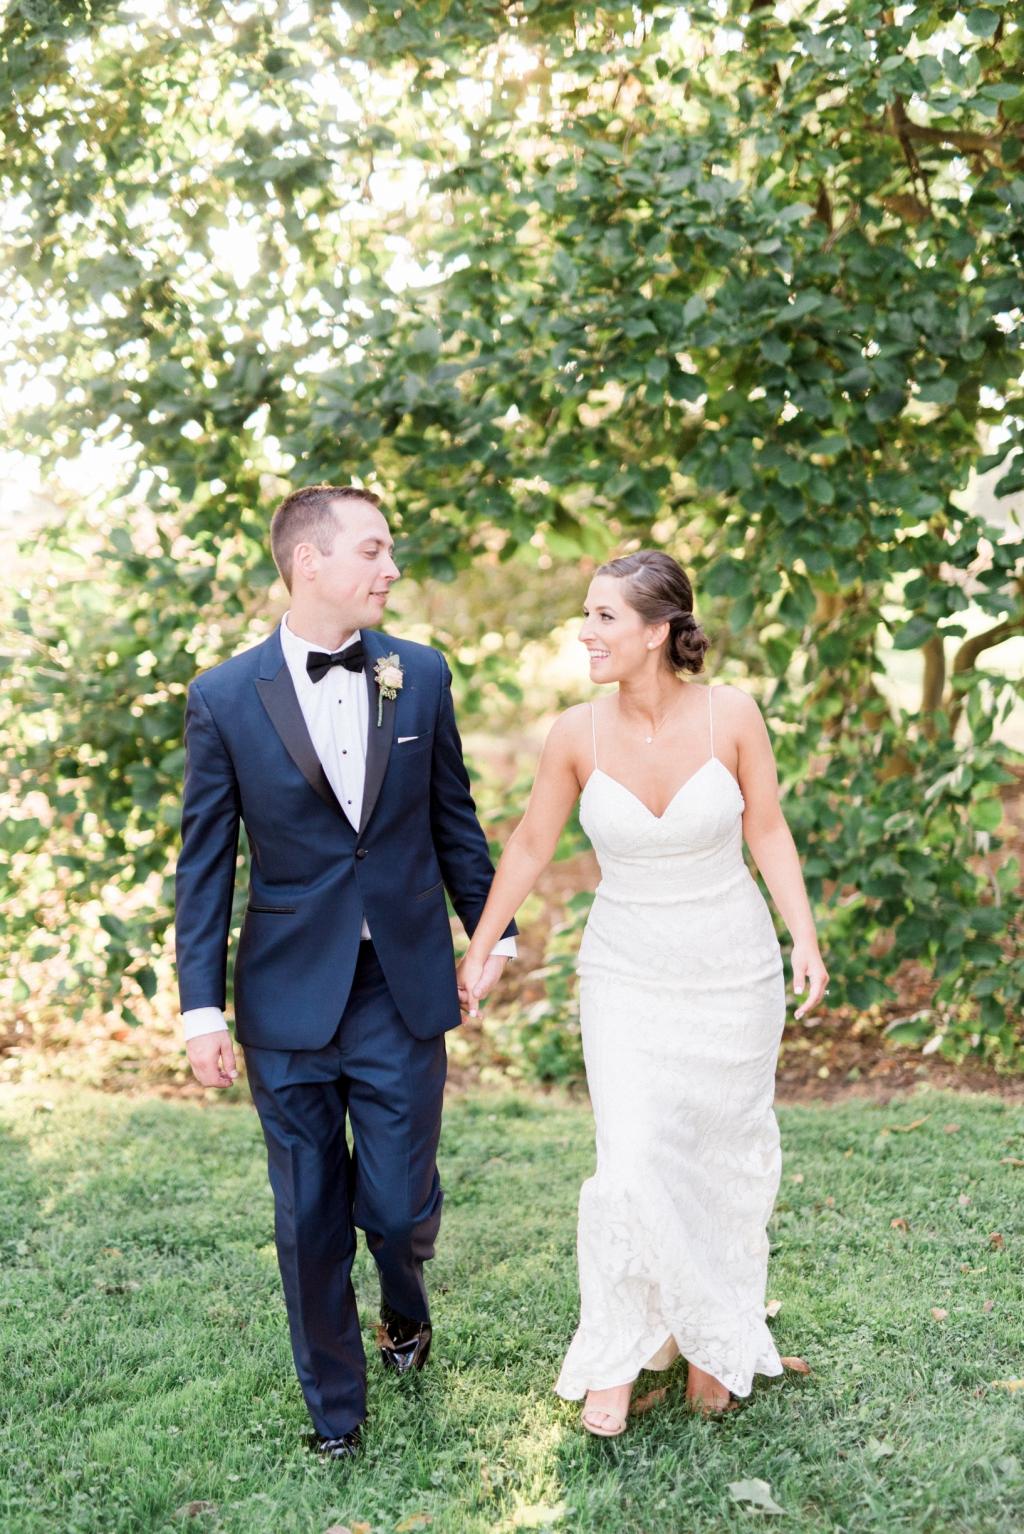 haley-richter-photography-buena-vista-confrence-center-wedding-summer-144